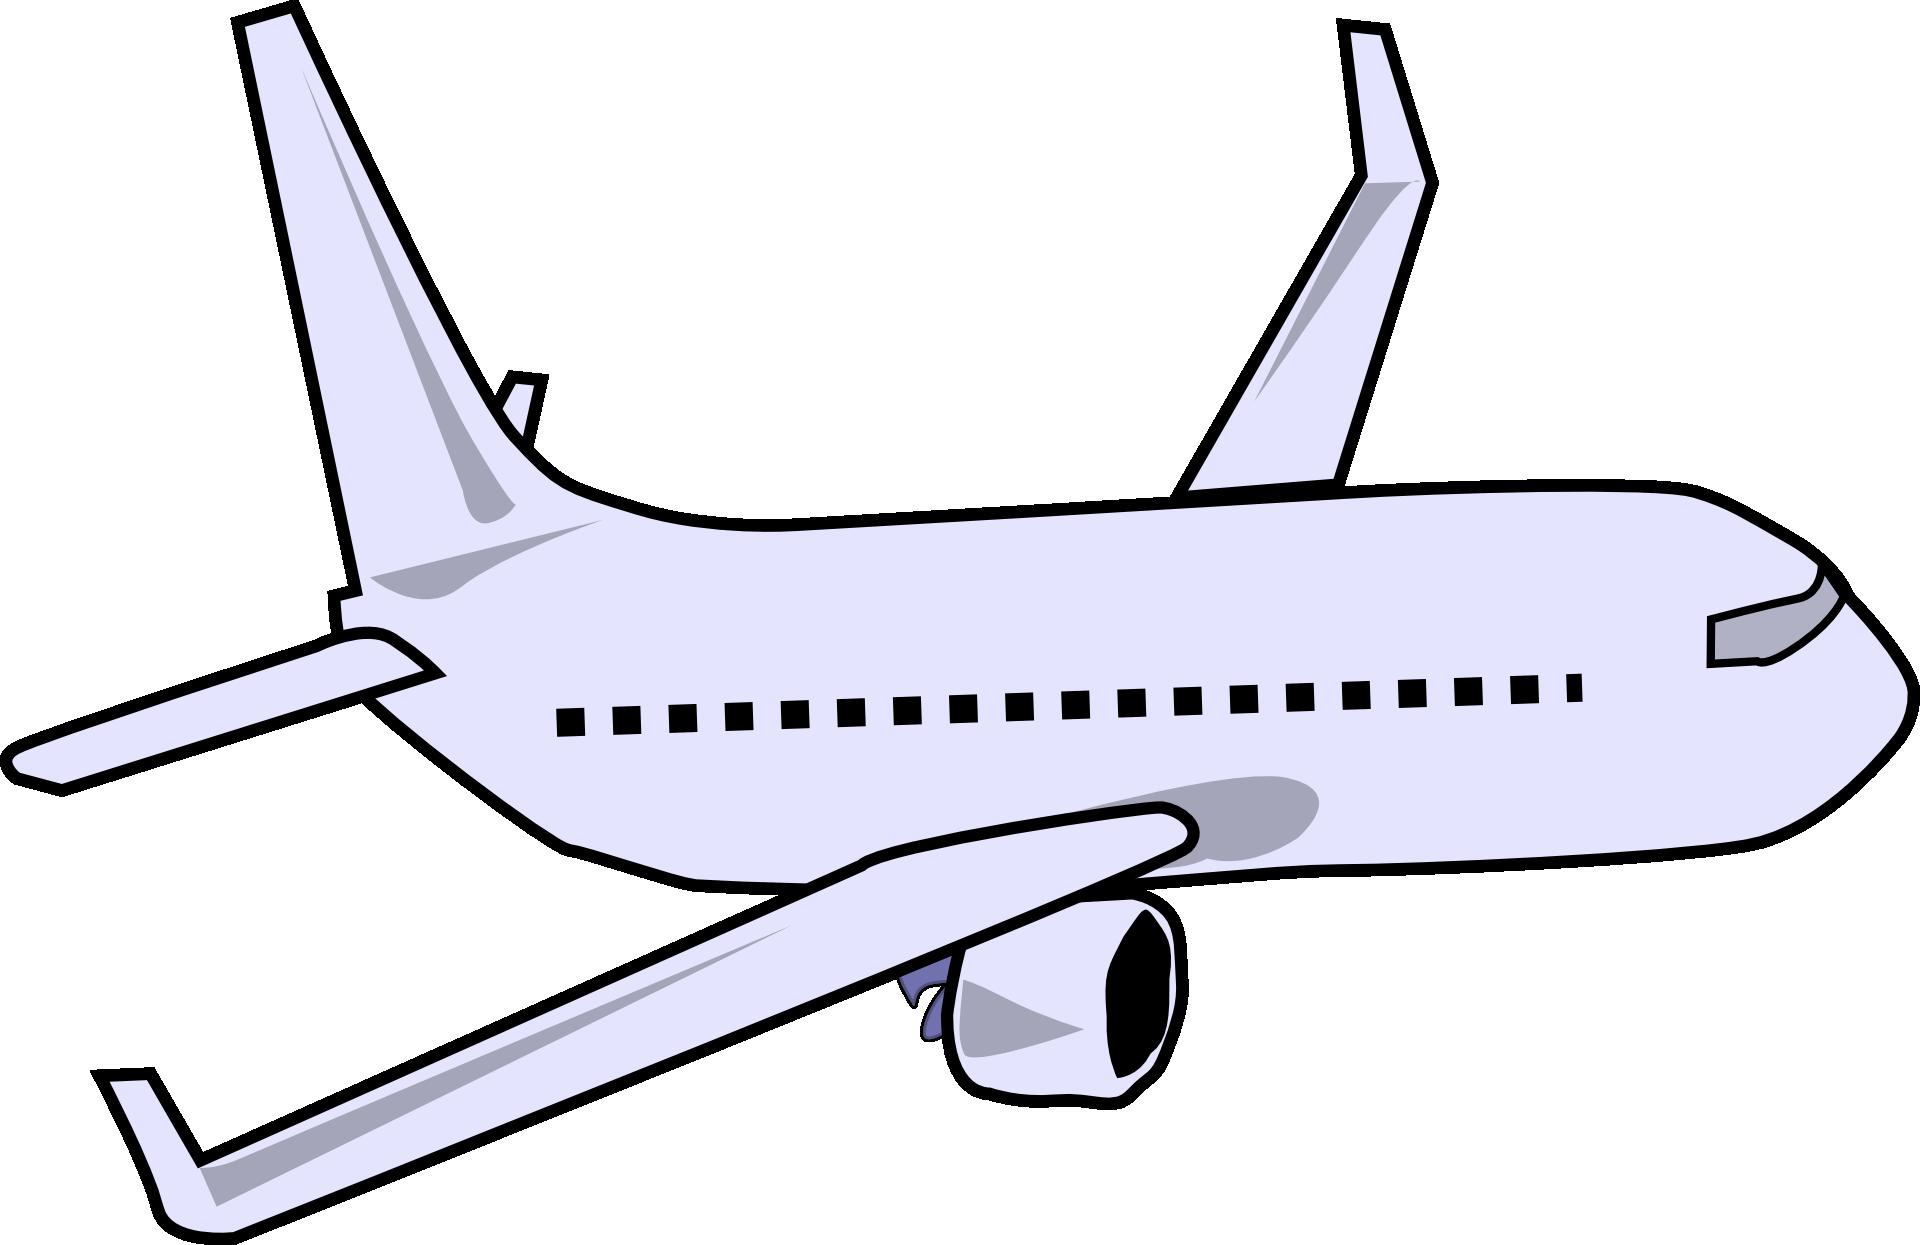 Grey Small Airplane Drawing Free Image